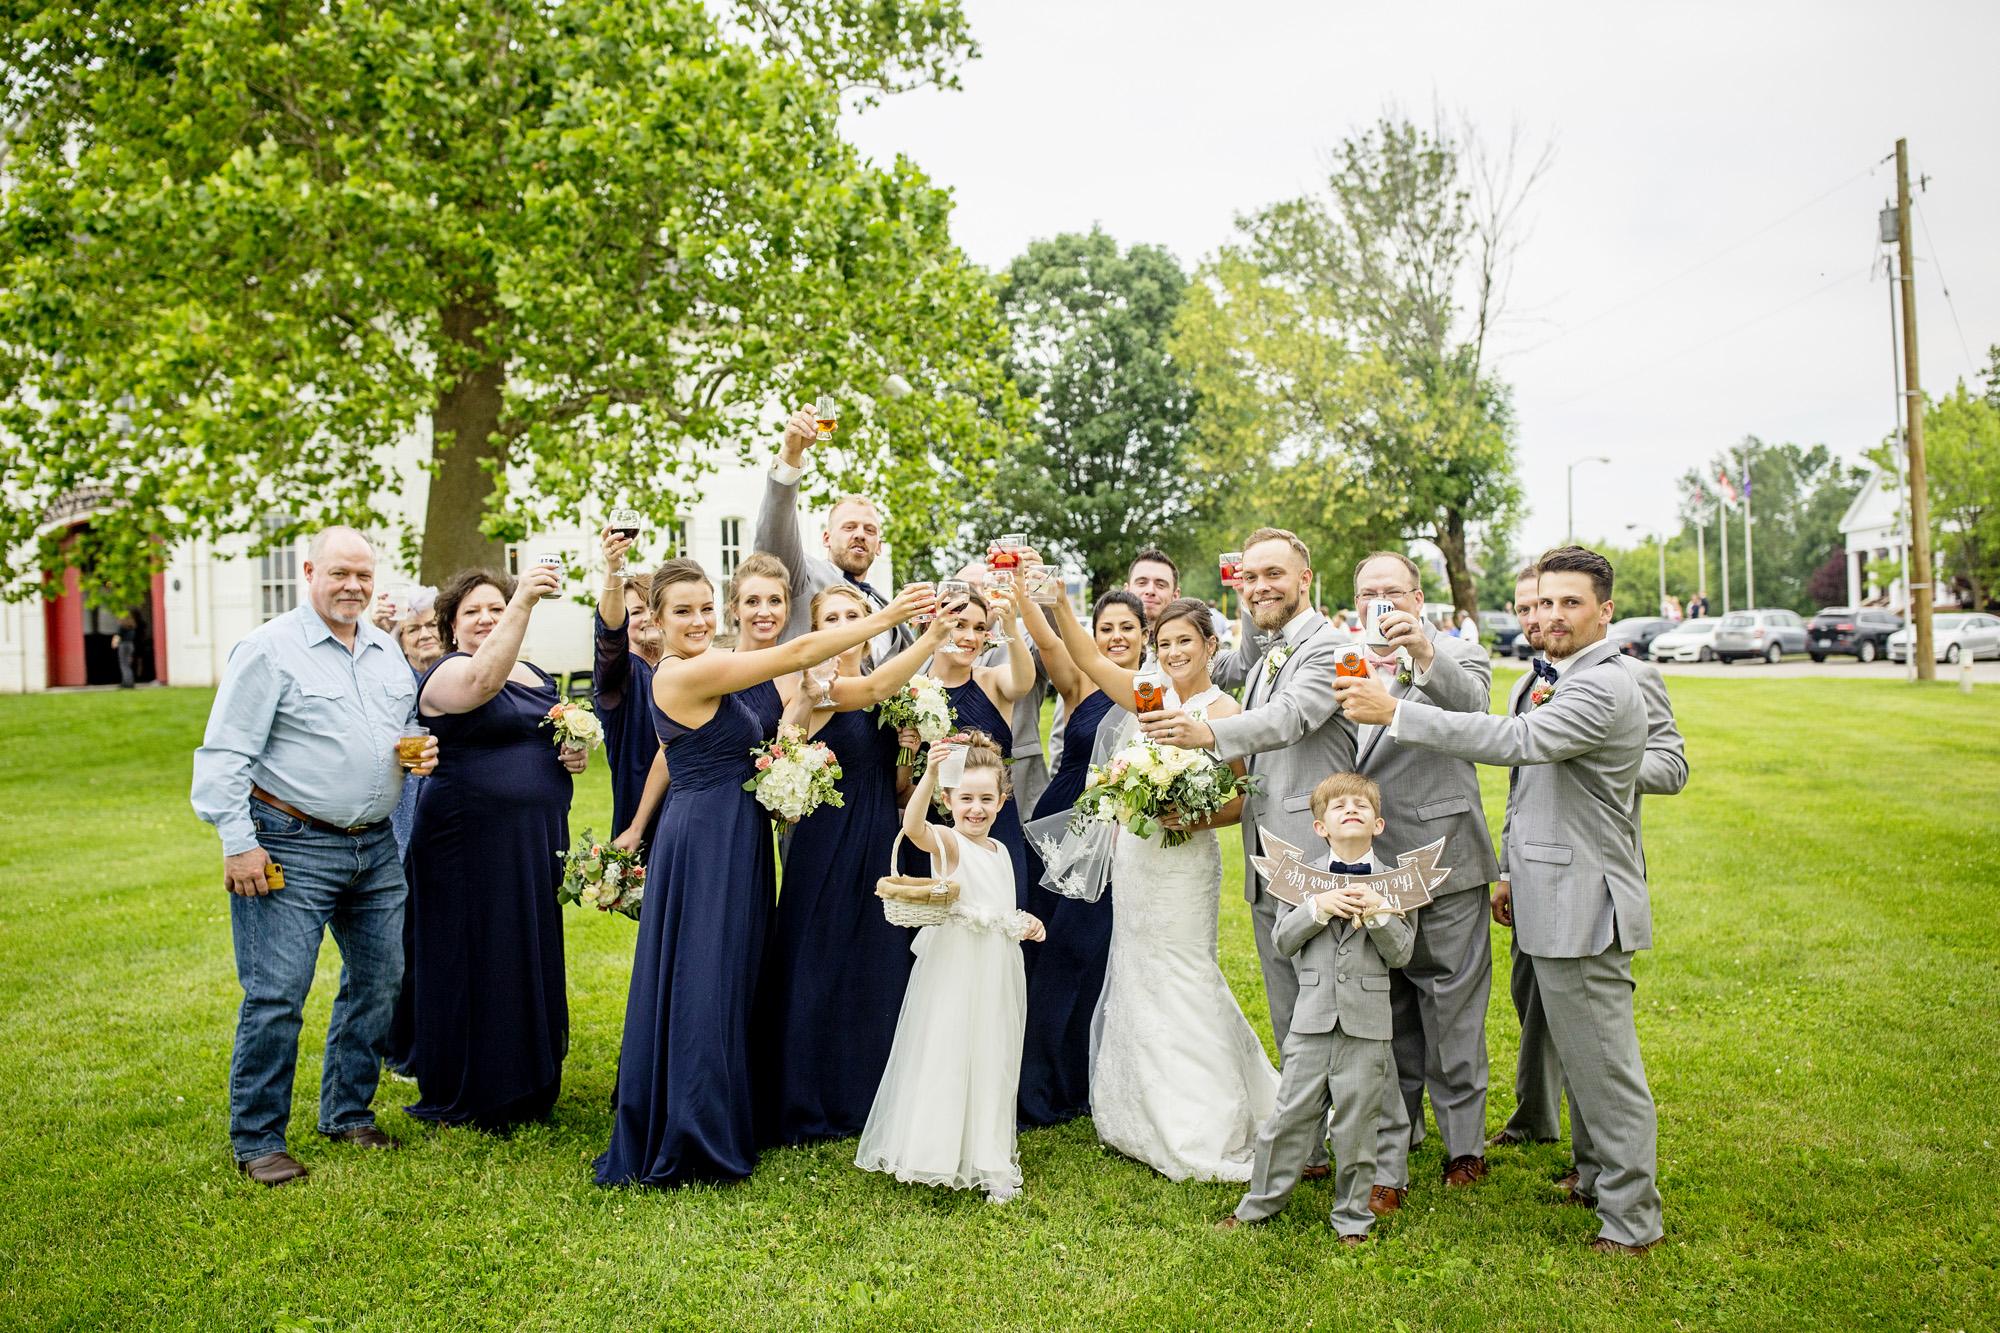 Seriously_Sabrina_Photography_Lexington_Kentucky_Round_Barn_Red_Mile_Stable_of_Memories_Wedding_Hart_79.jpg